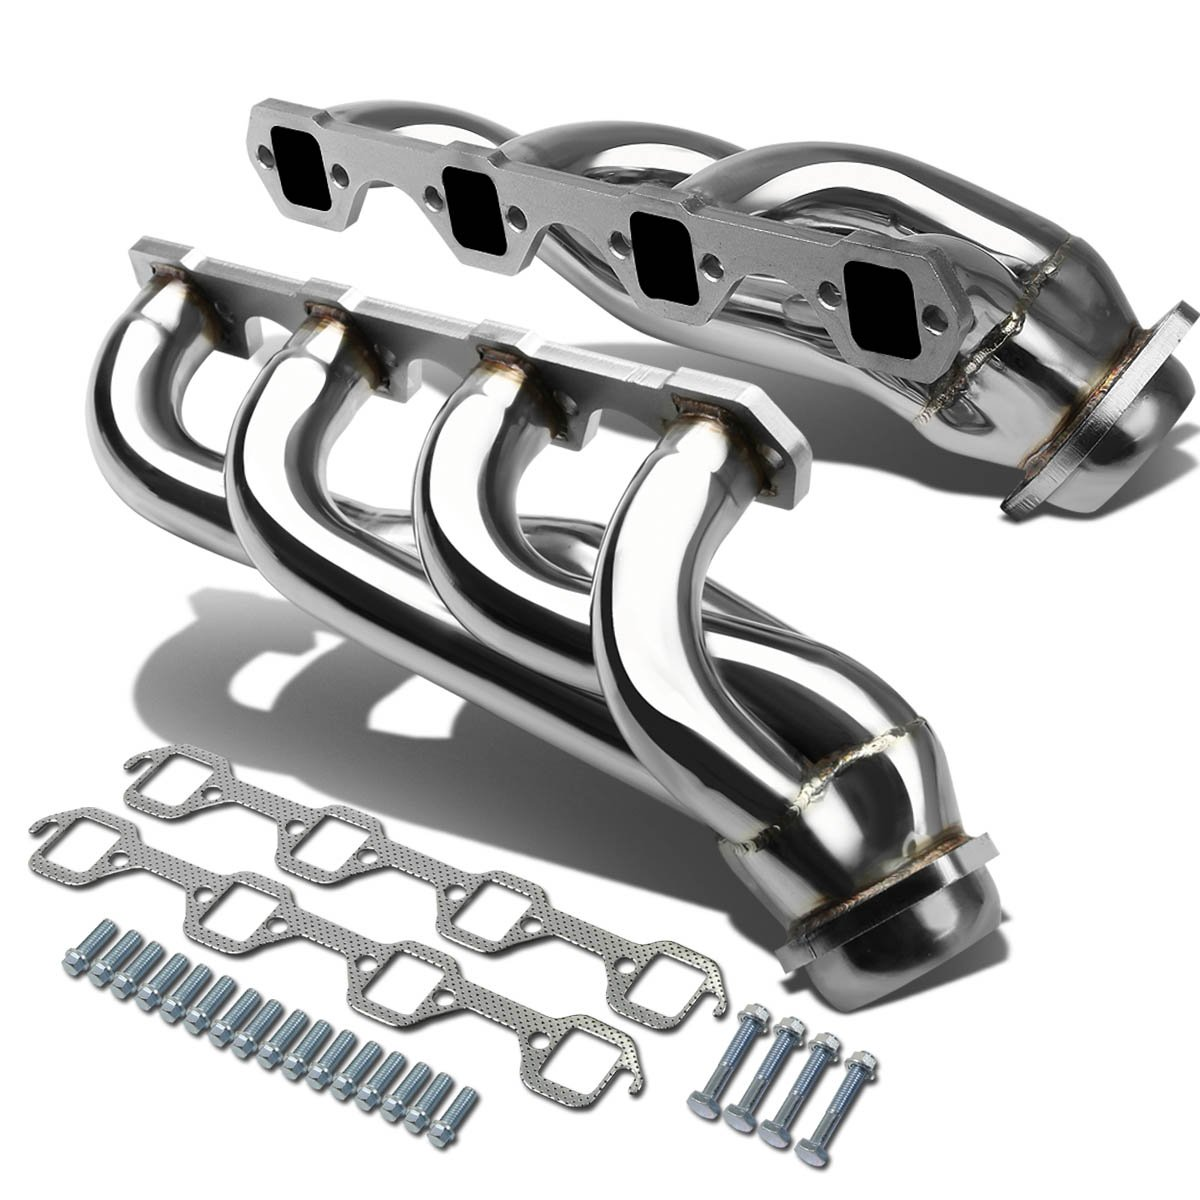 DNA MOTORING HDS-JCW0738 HDSJCW0738 Stainless Steel Exhaust Header Manifold